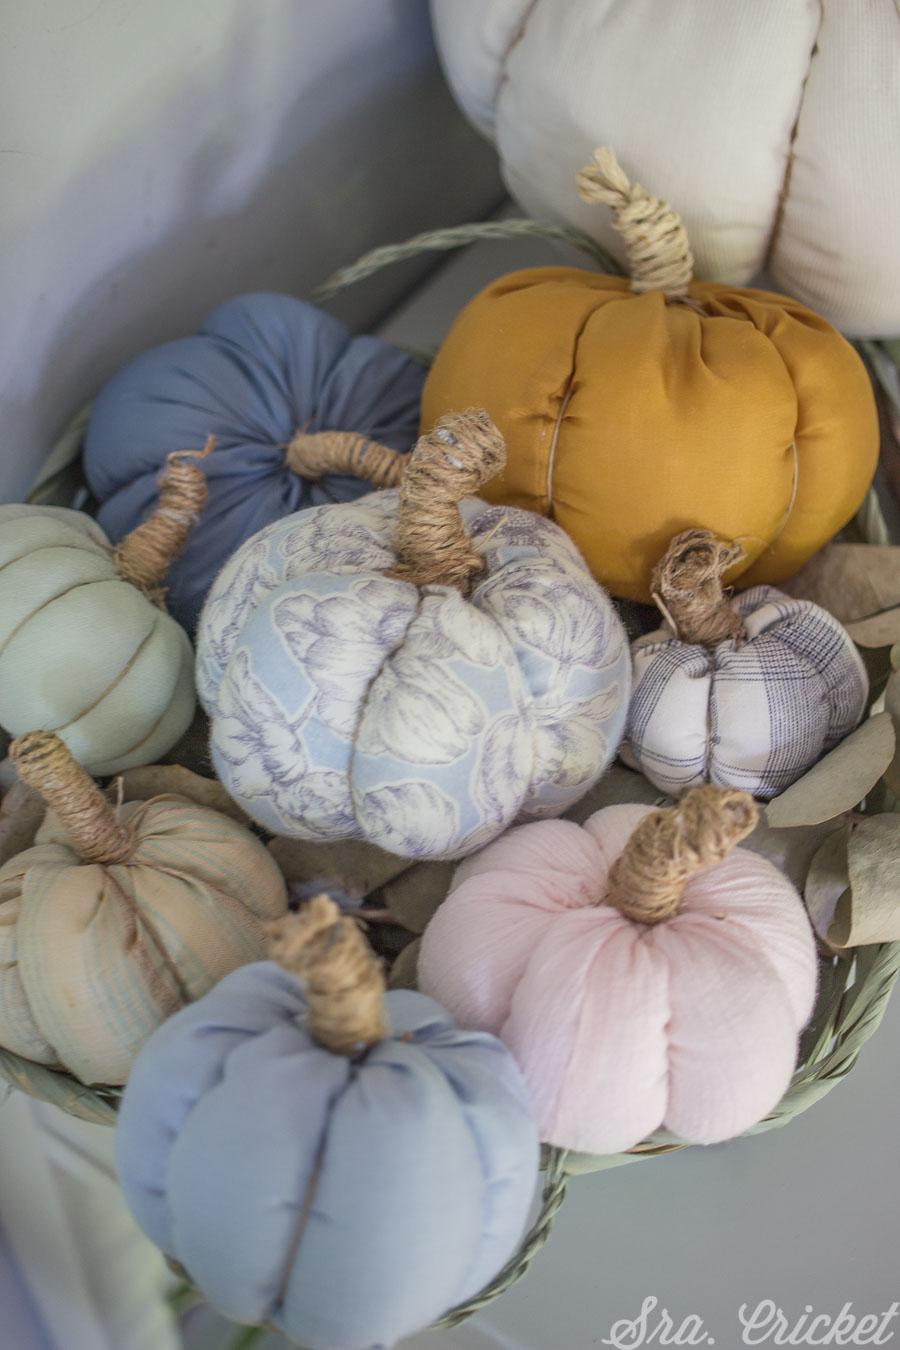 calabazas de tela hechas a mano sin coser